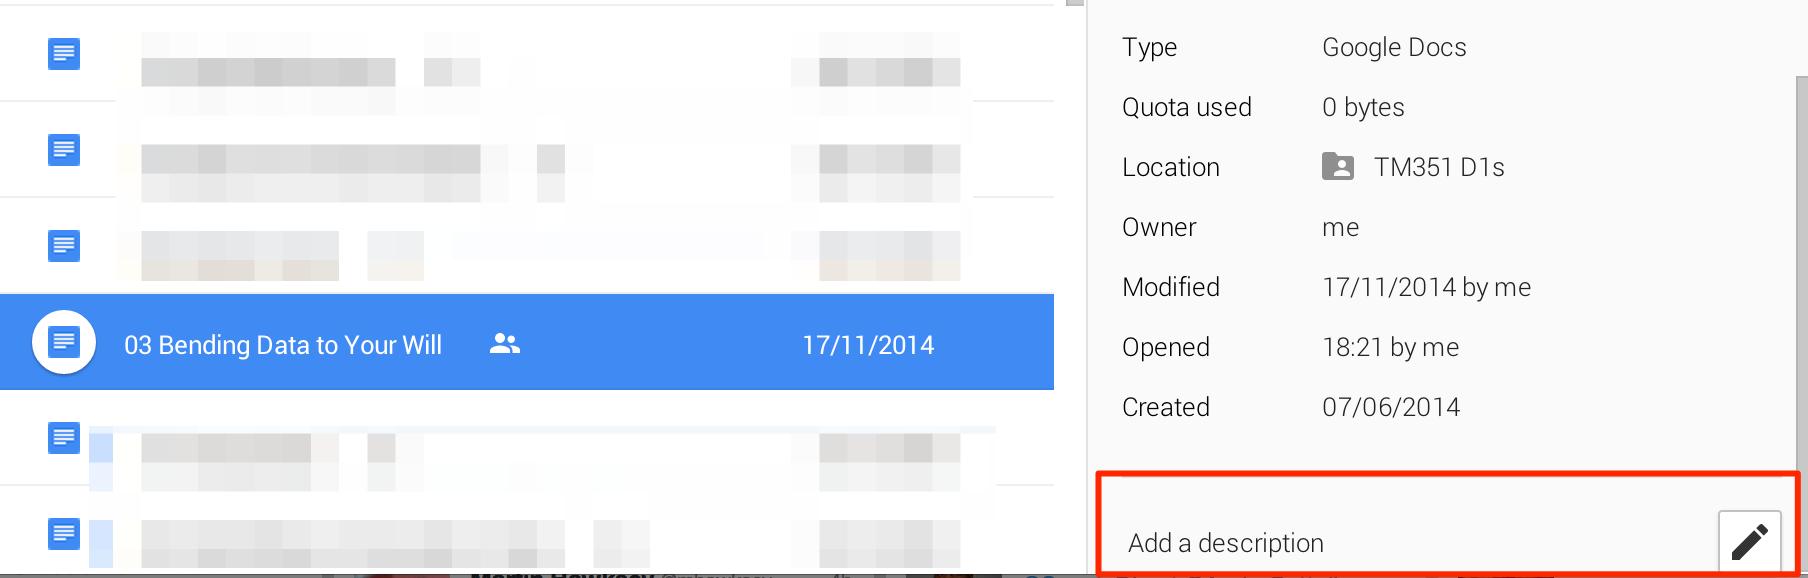 Adding Metadata To Google Docs OUsefulInfo The Blog - When was google docs created